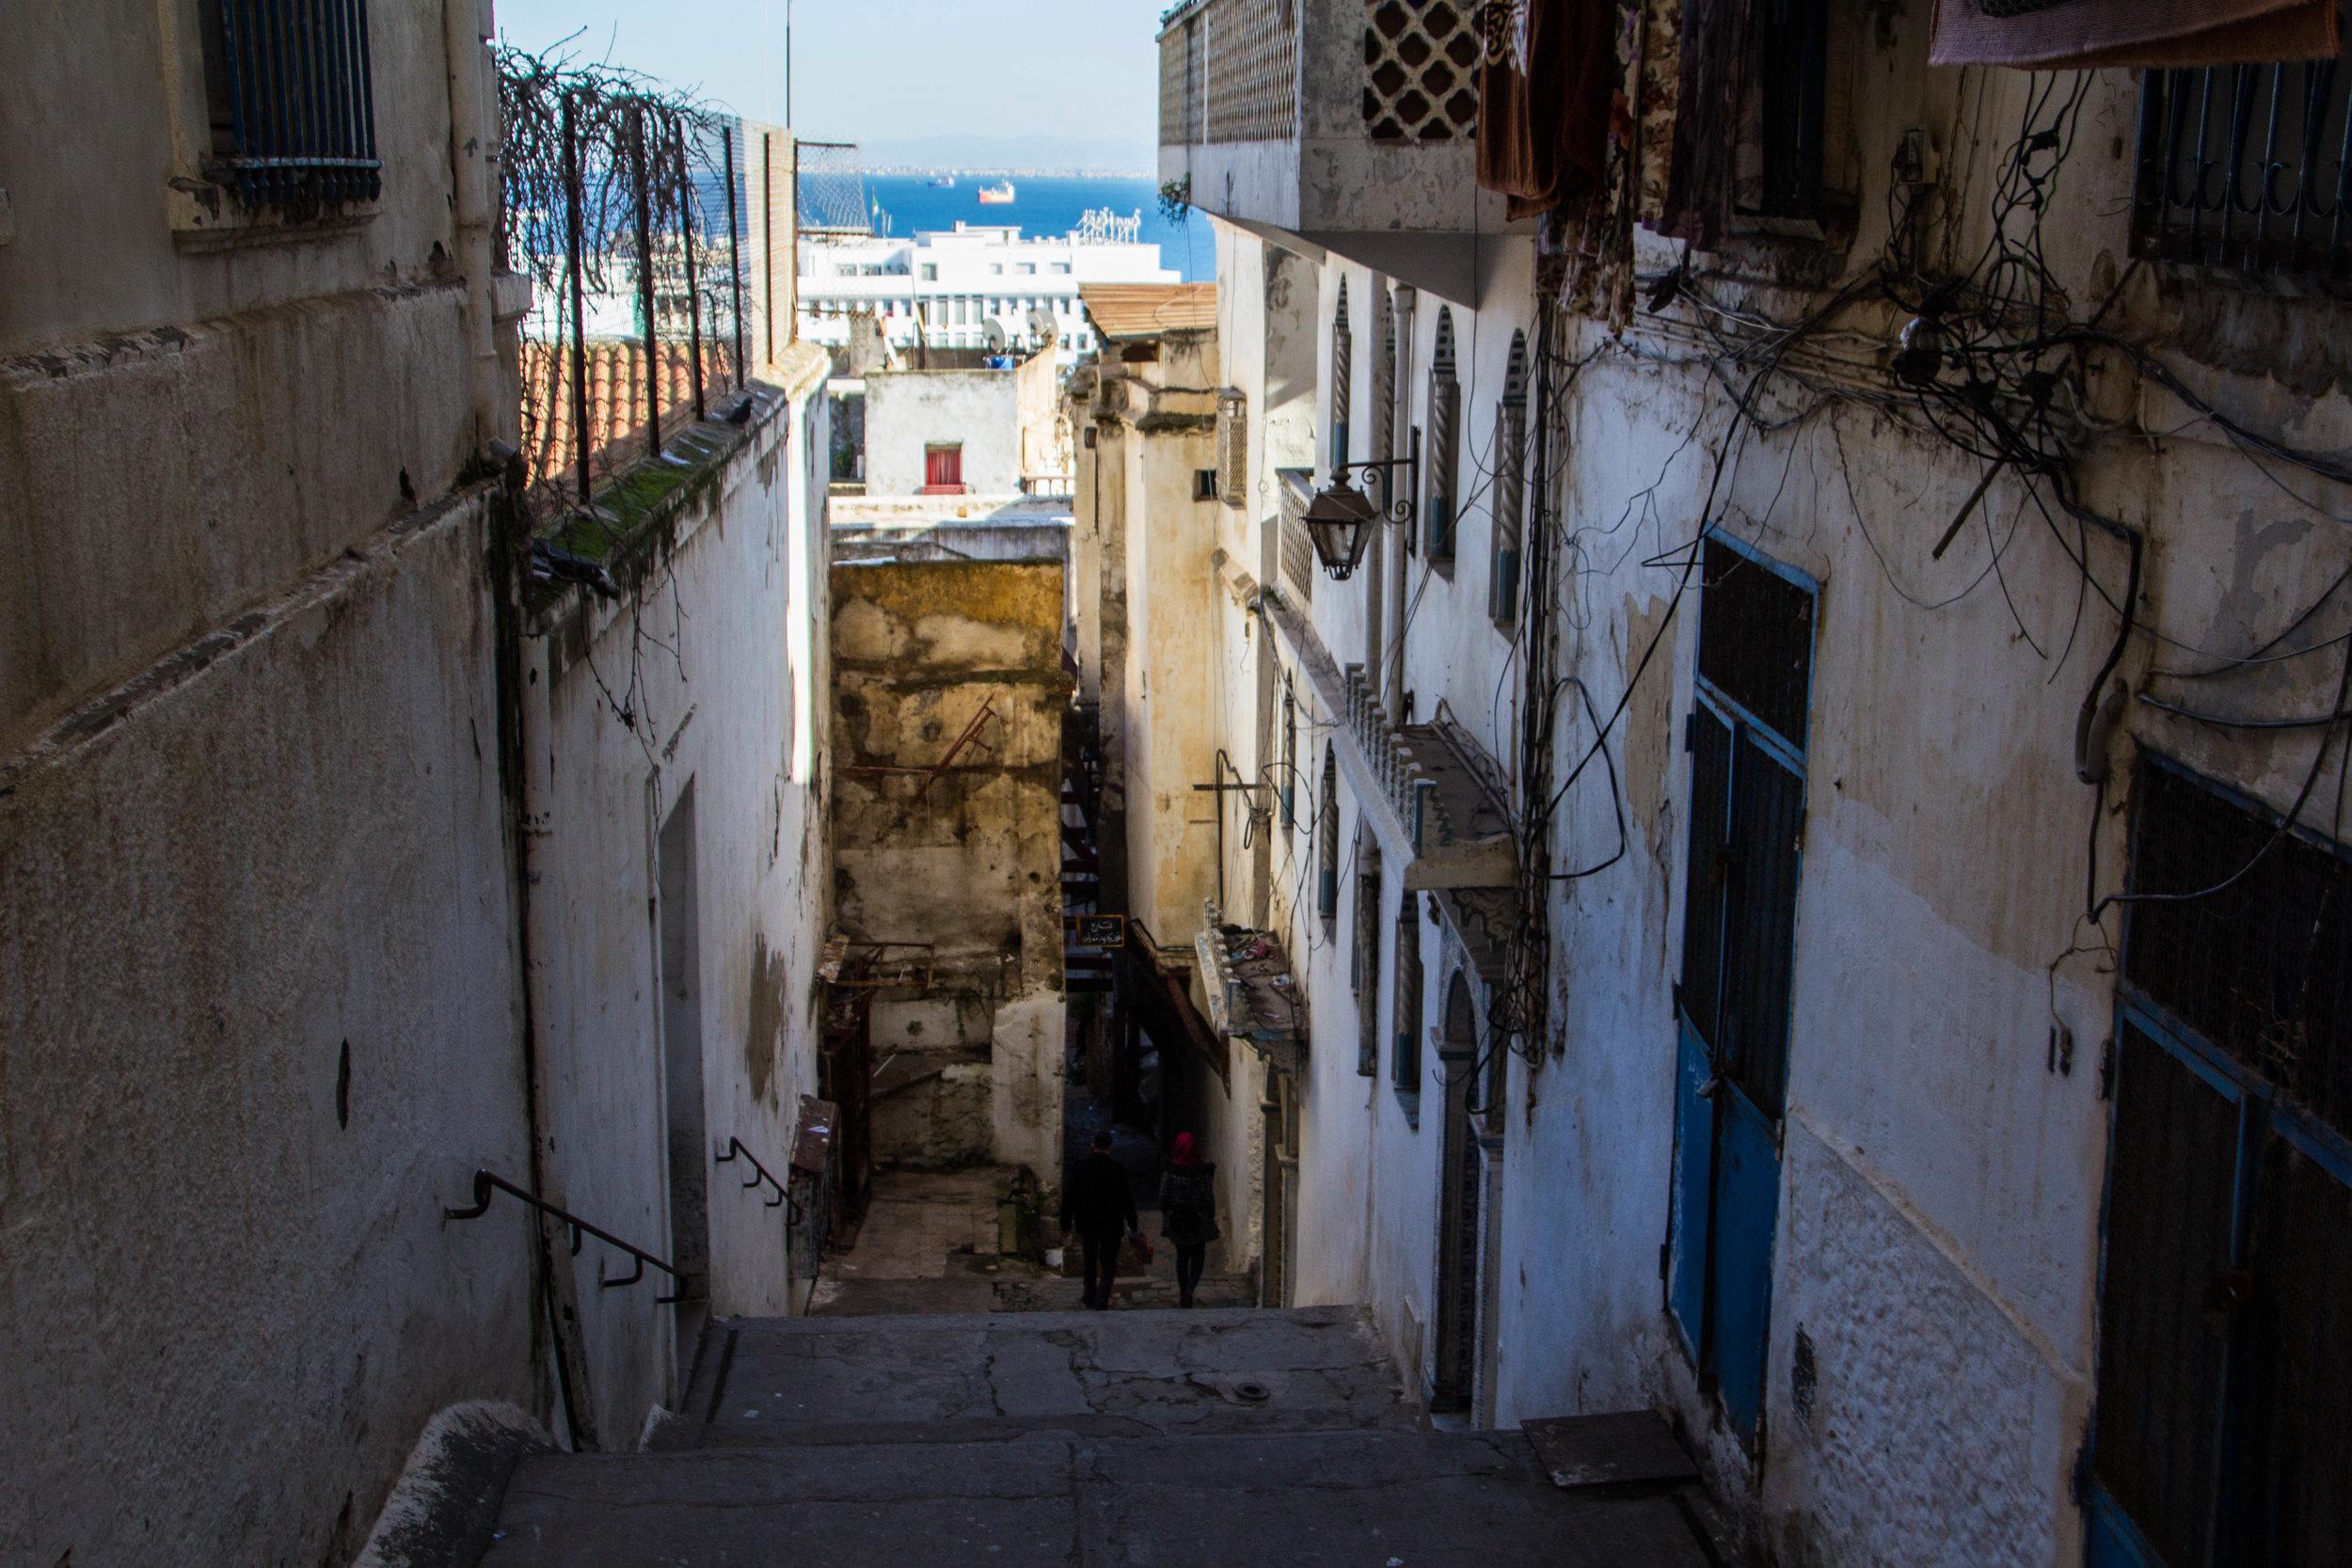 casbah-photography-algiers-algeria-alger-68.jpg